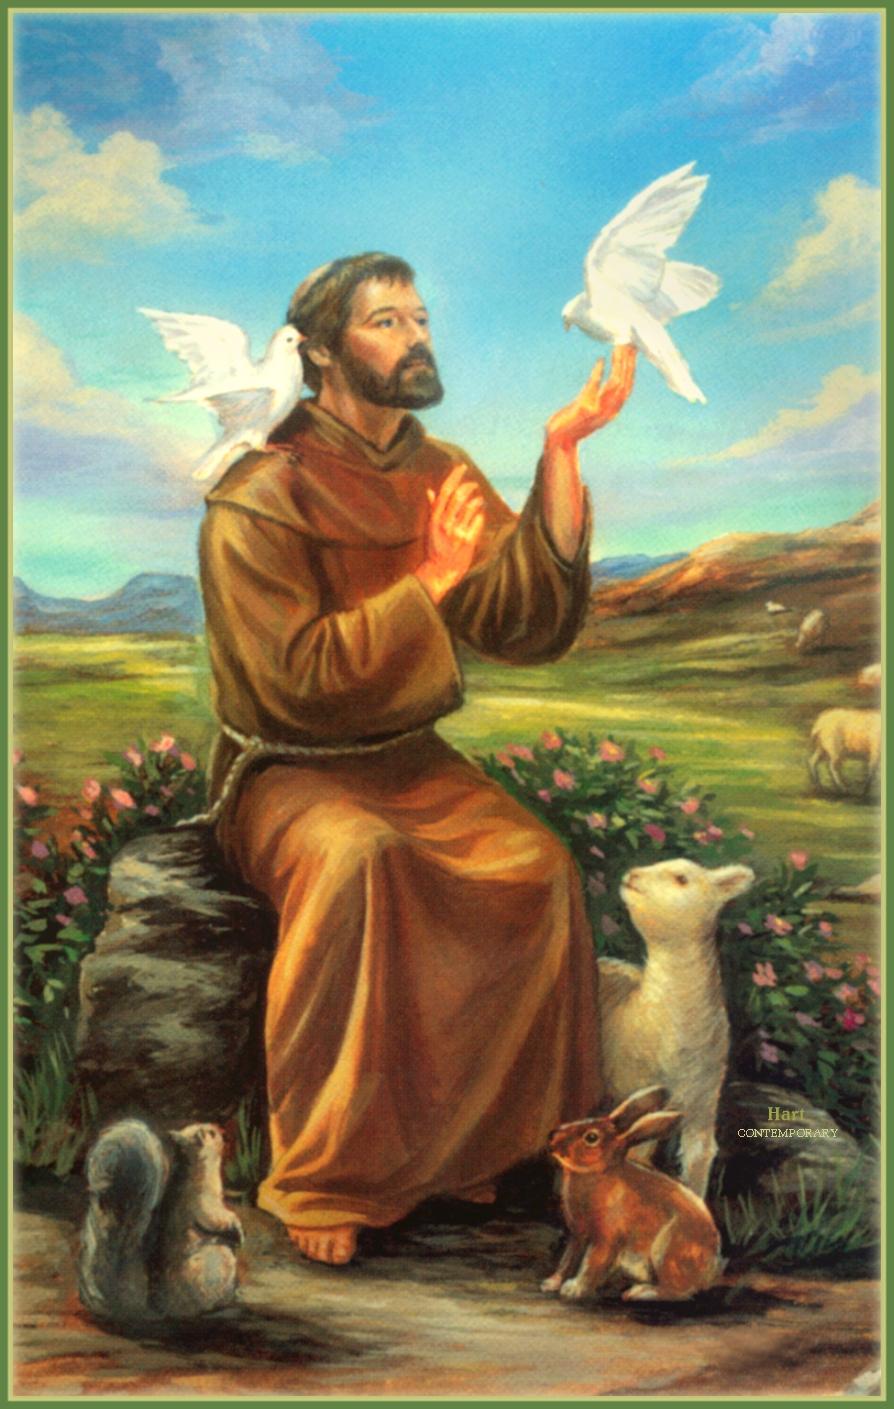 Saint feast day october 26 celebrity